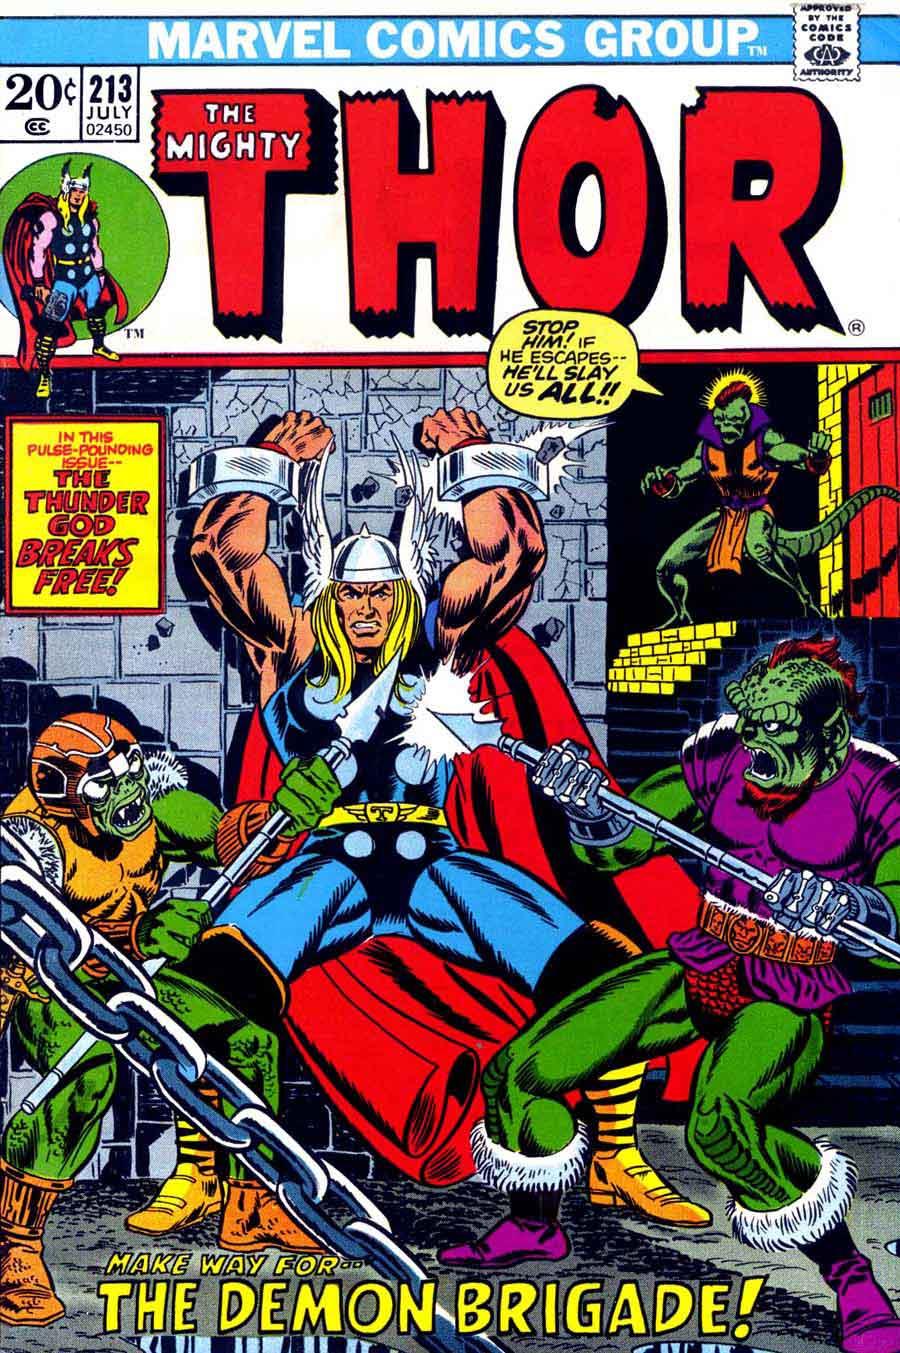 Comic Book Cover Art : Thor jim starlin cover pencil ink